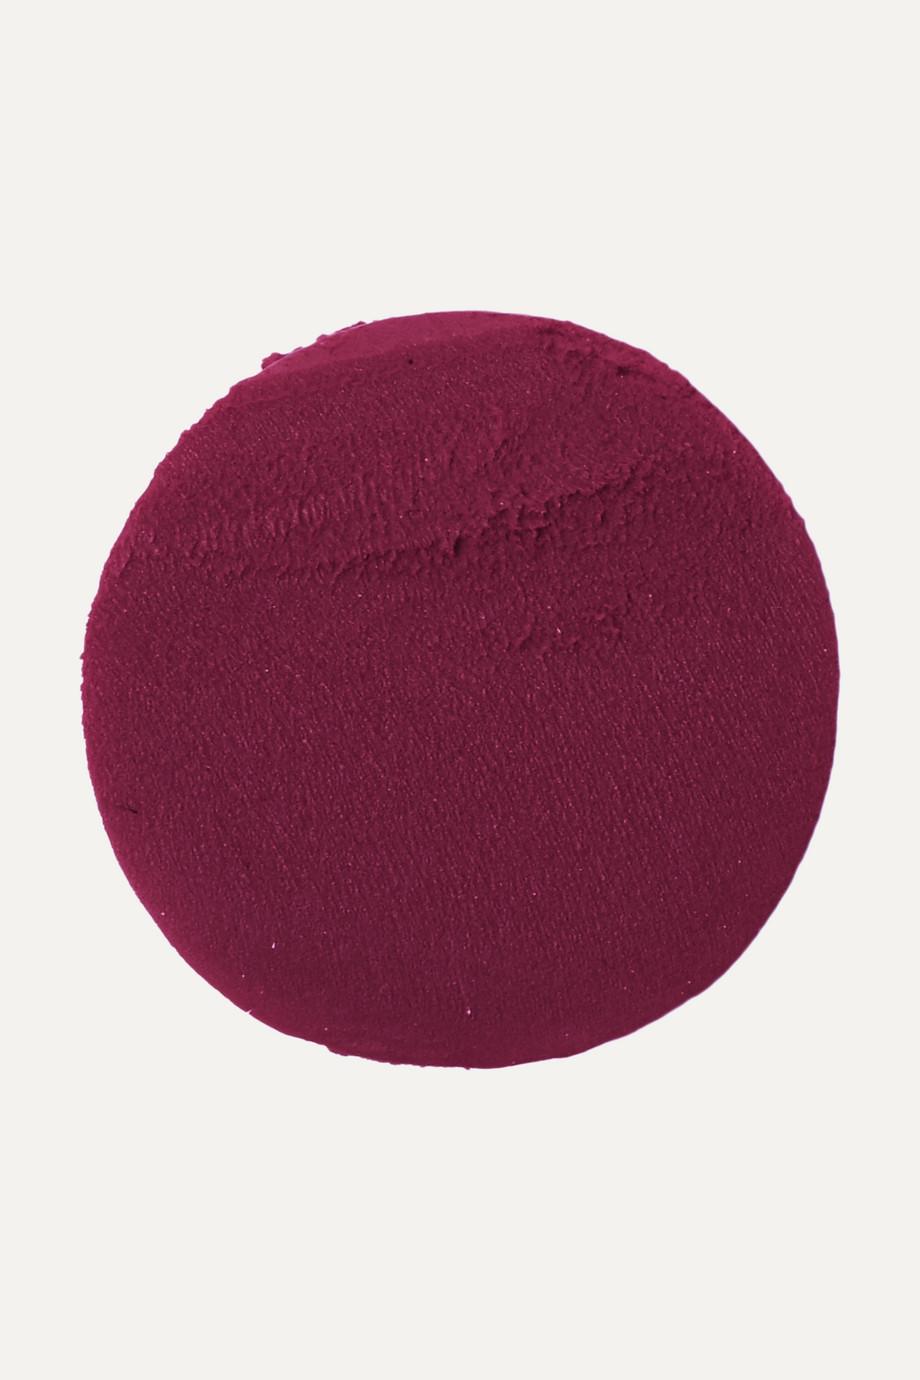 Code8 Matte Velour Lipstick - Lost in Translation